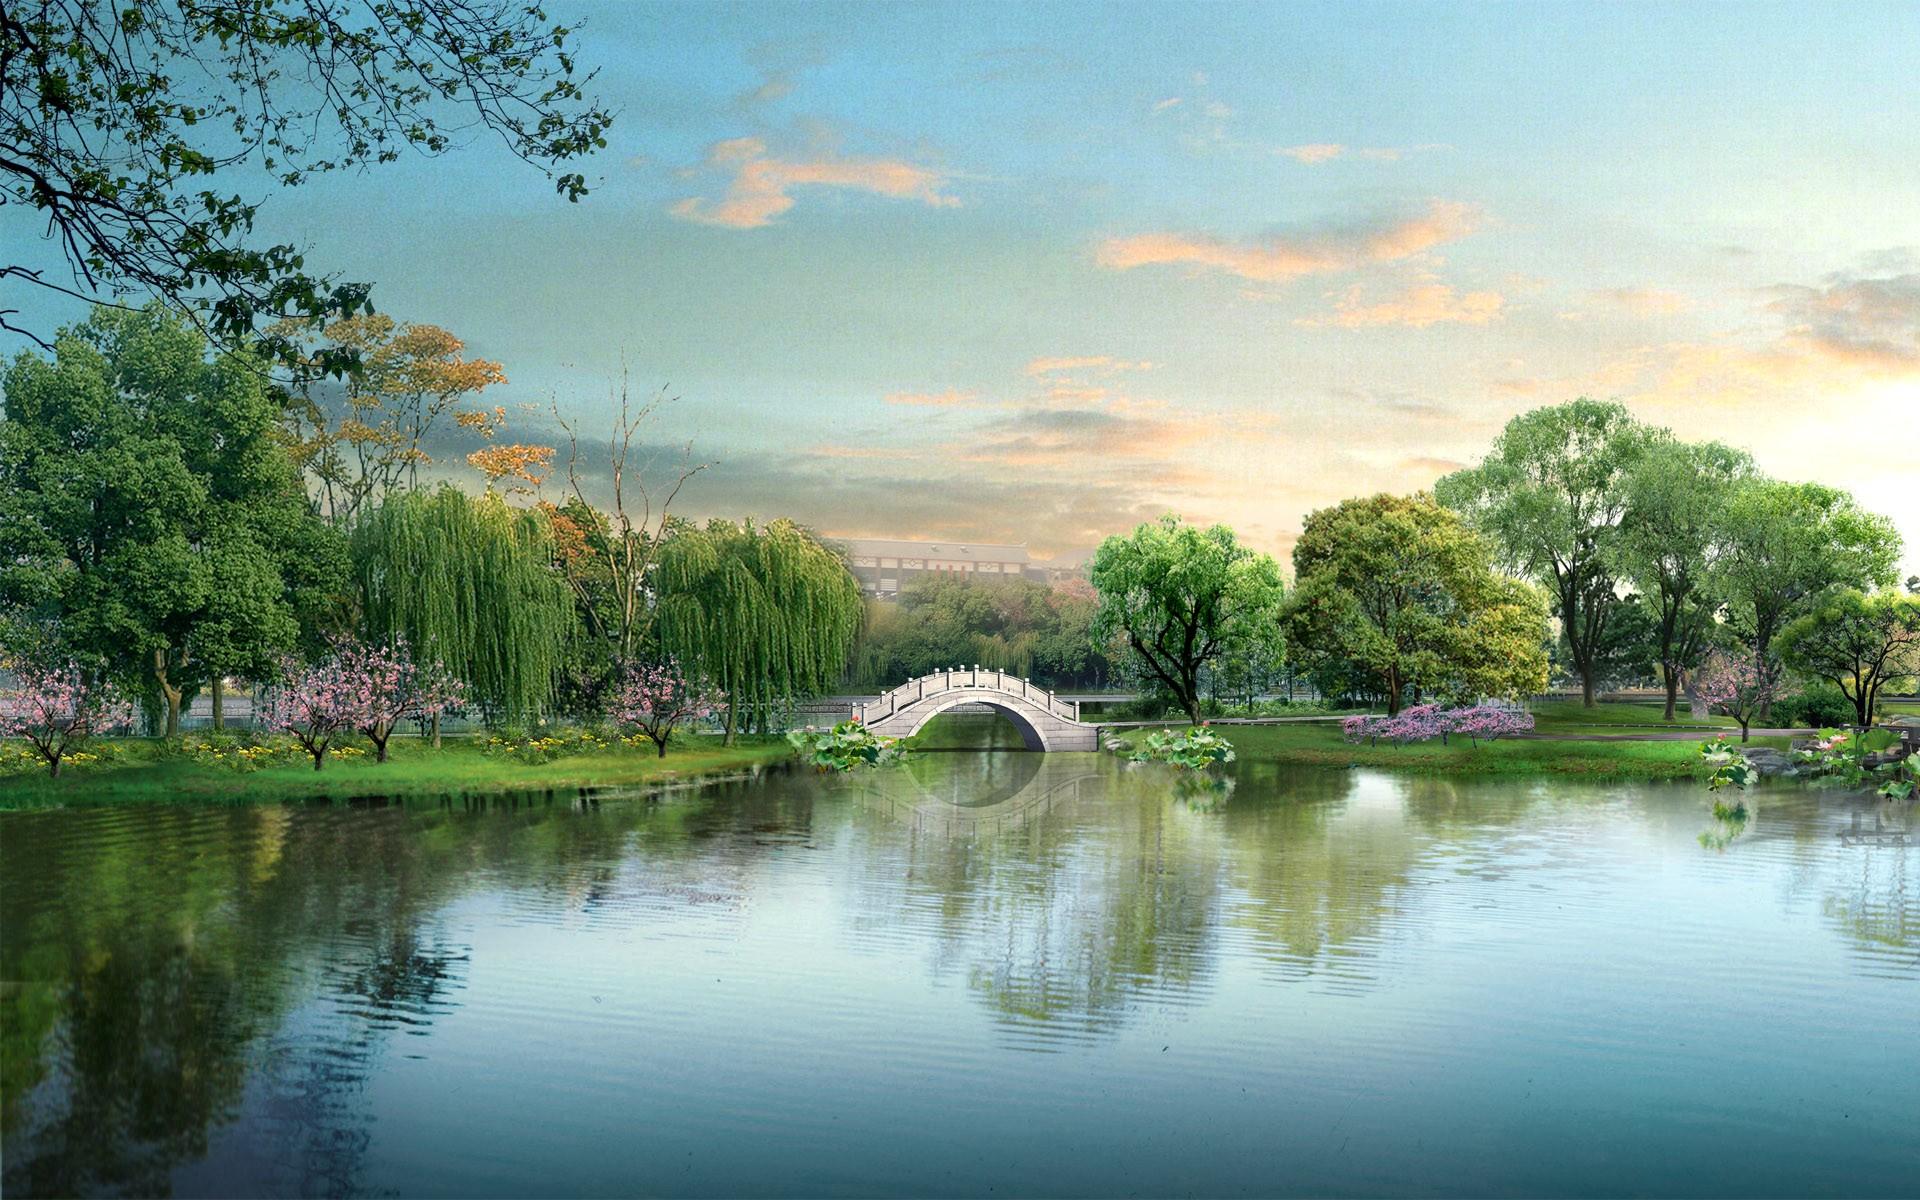 Landscapes Wallpapers HD Widescreen Desktop Wallpaper widescreen 1920x1200